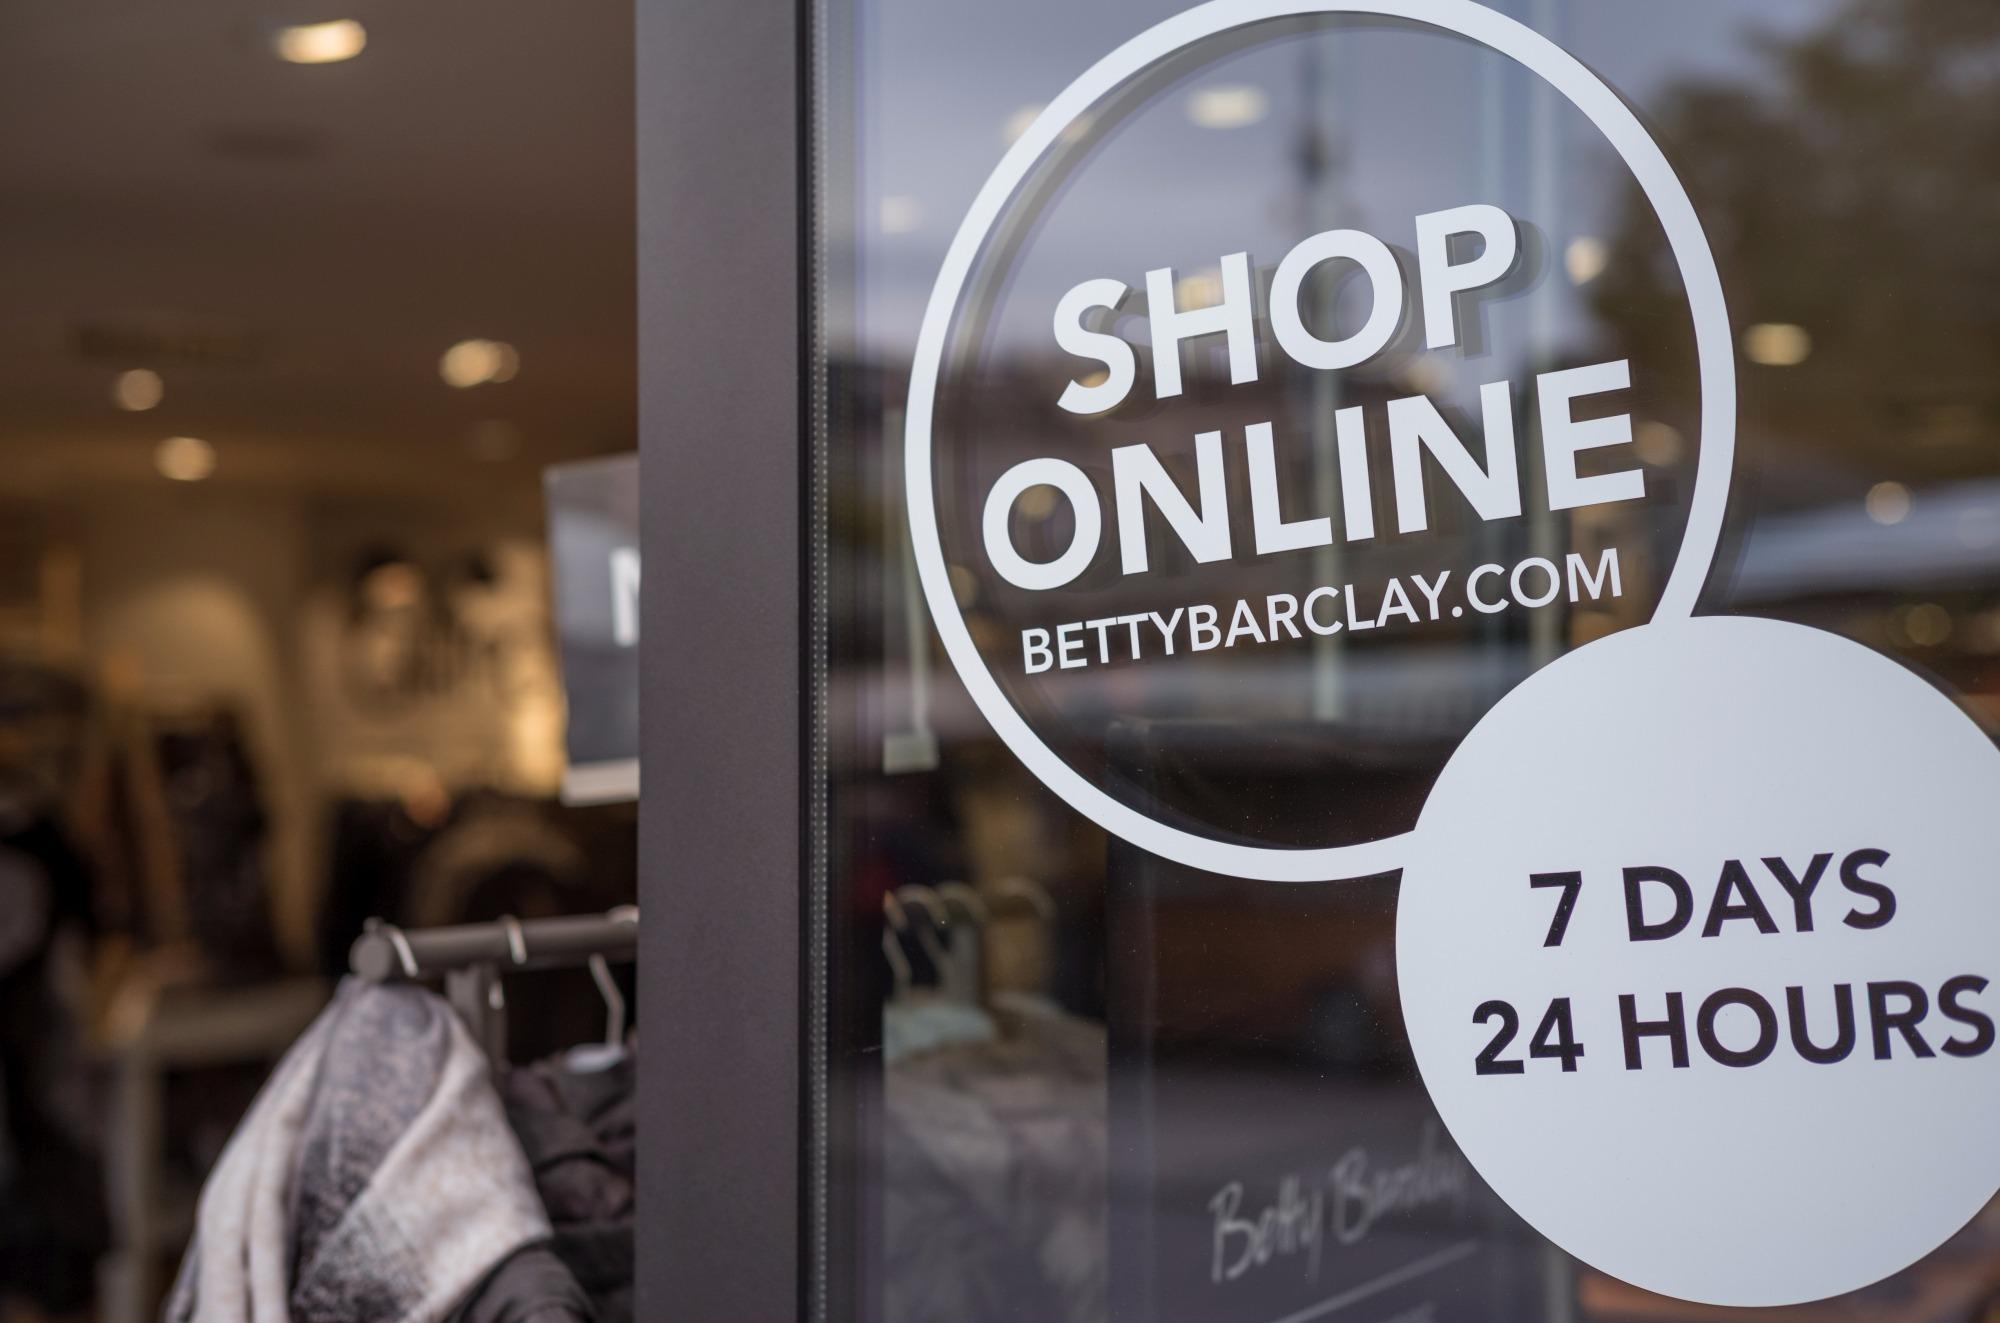 Betty Barclay Store, Rathausgasse 5 in Freiburg im Breisgau